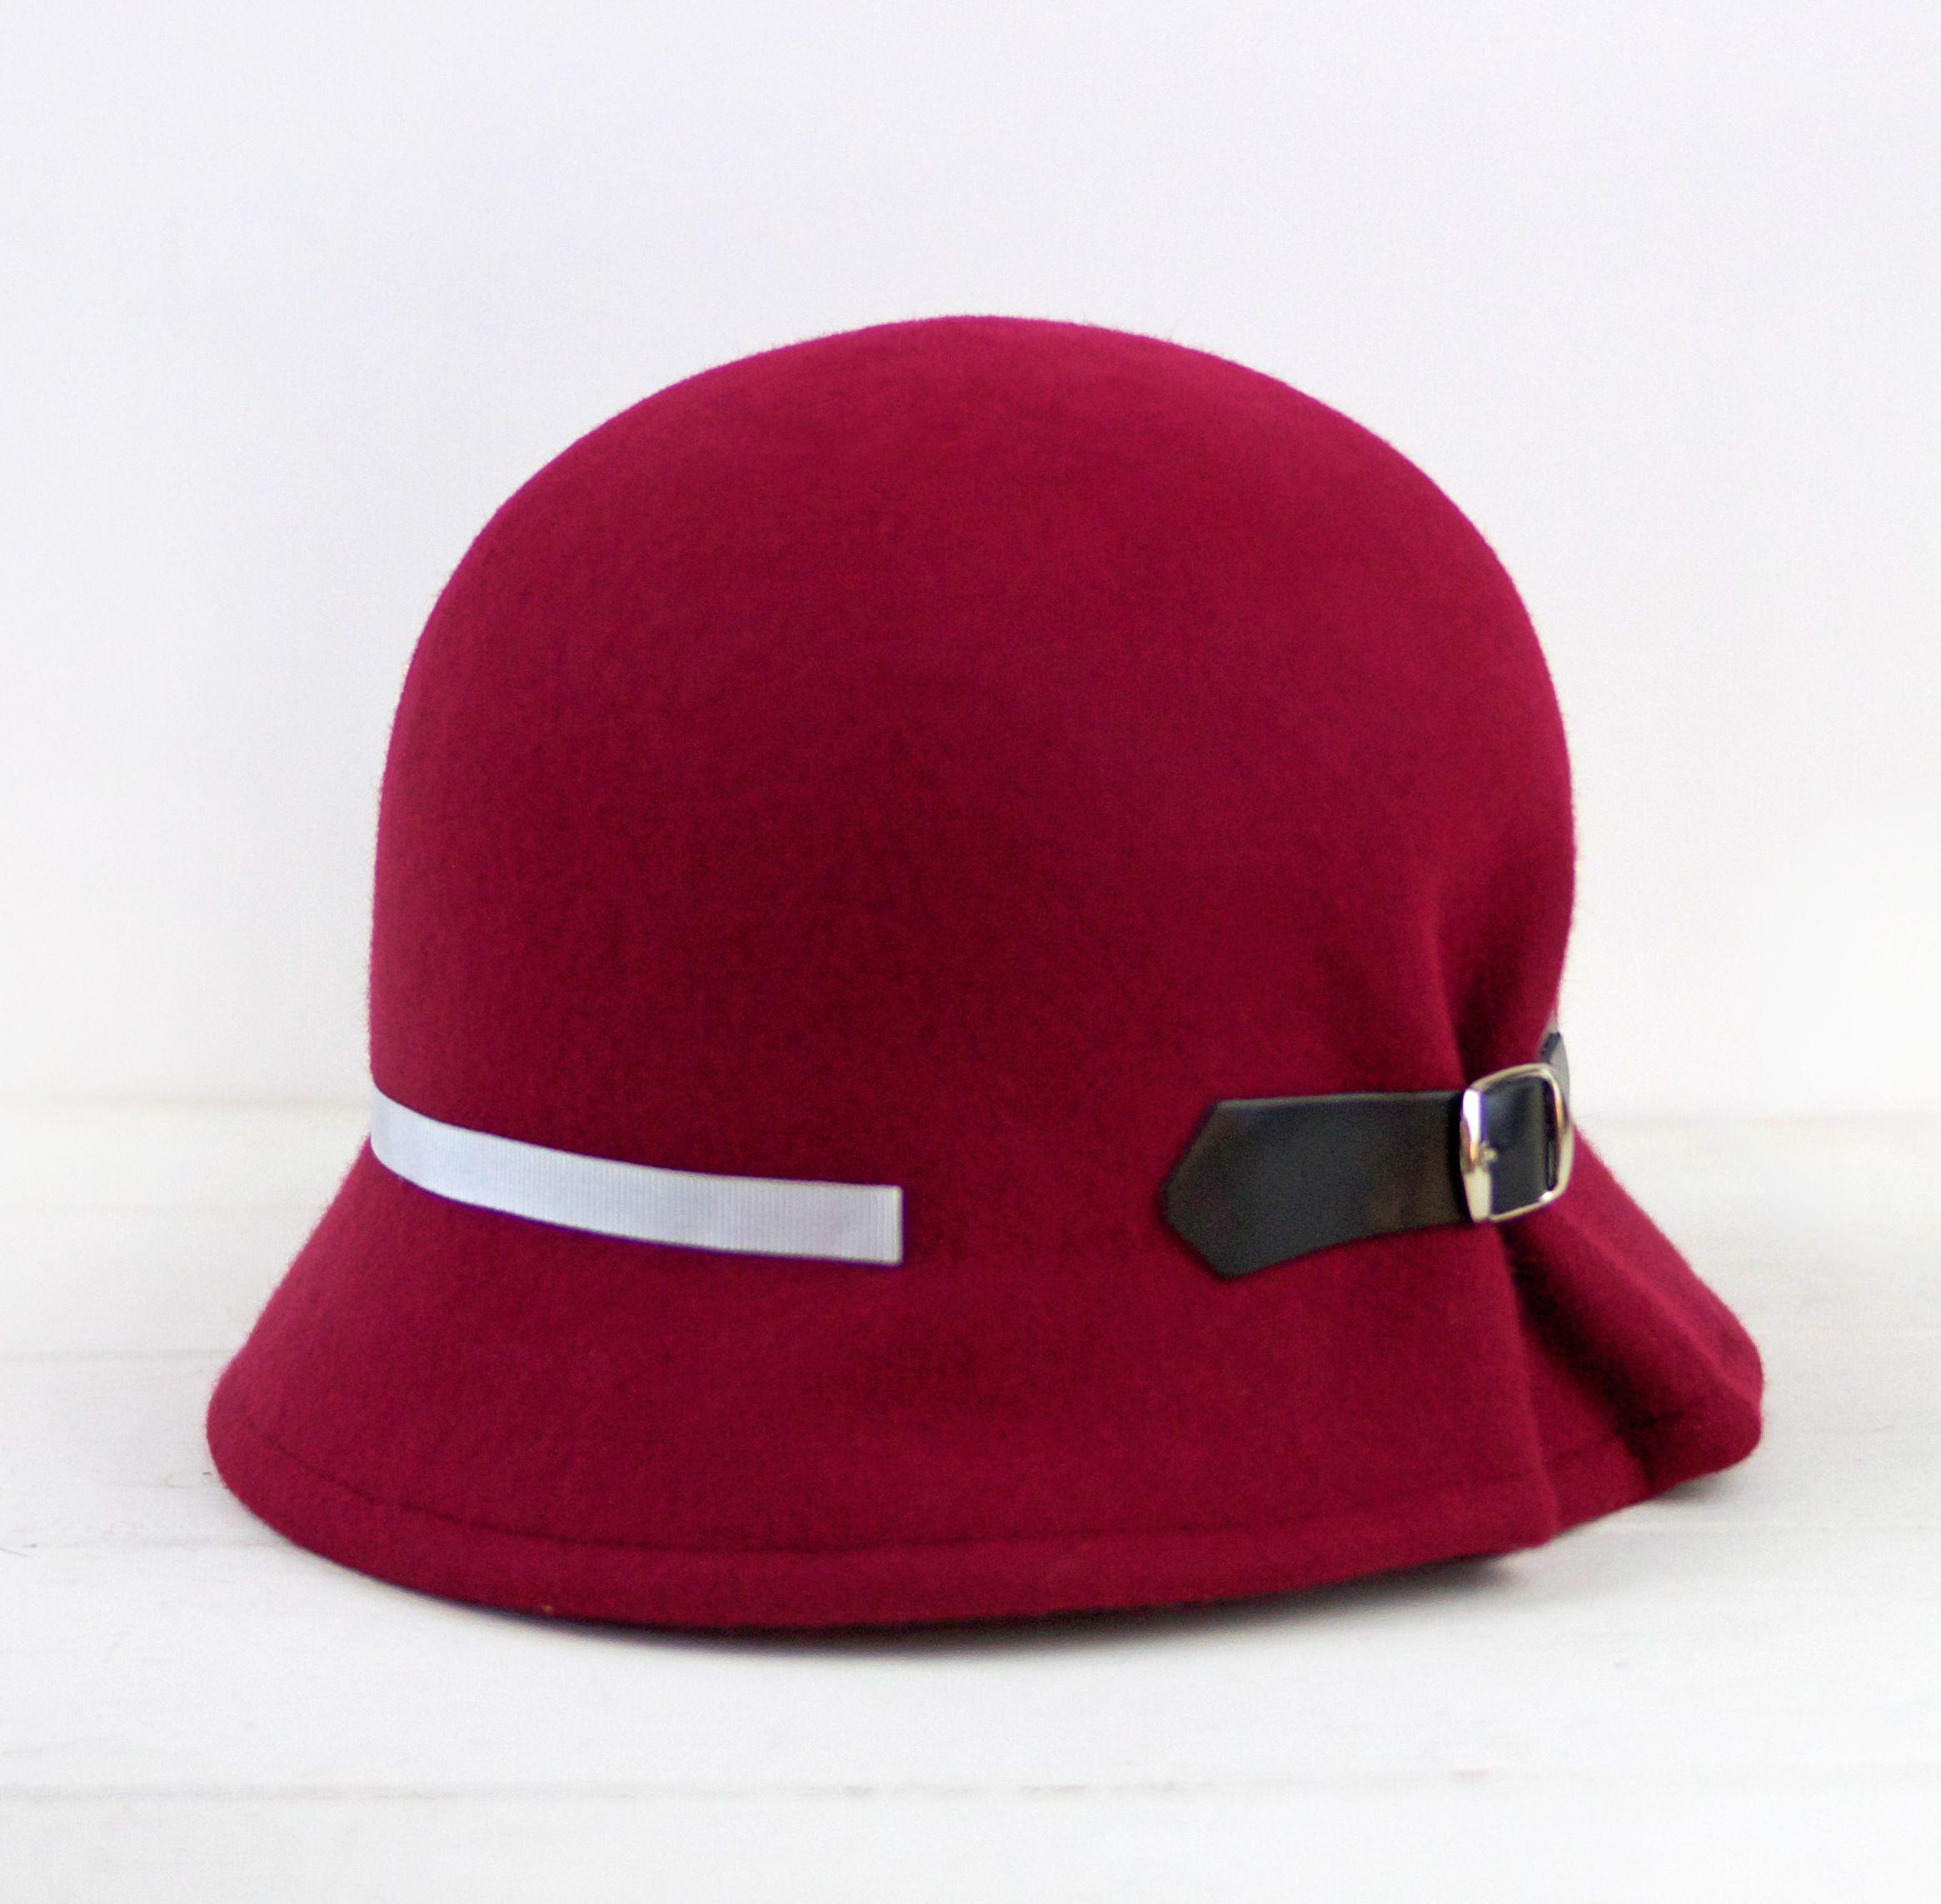 1b7834dc1 1920s women cloche, 1920s flapper hat, 1920s gatsby hat, 1920s ...